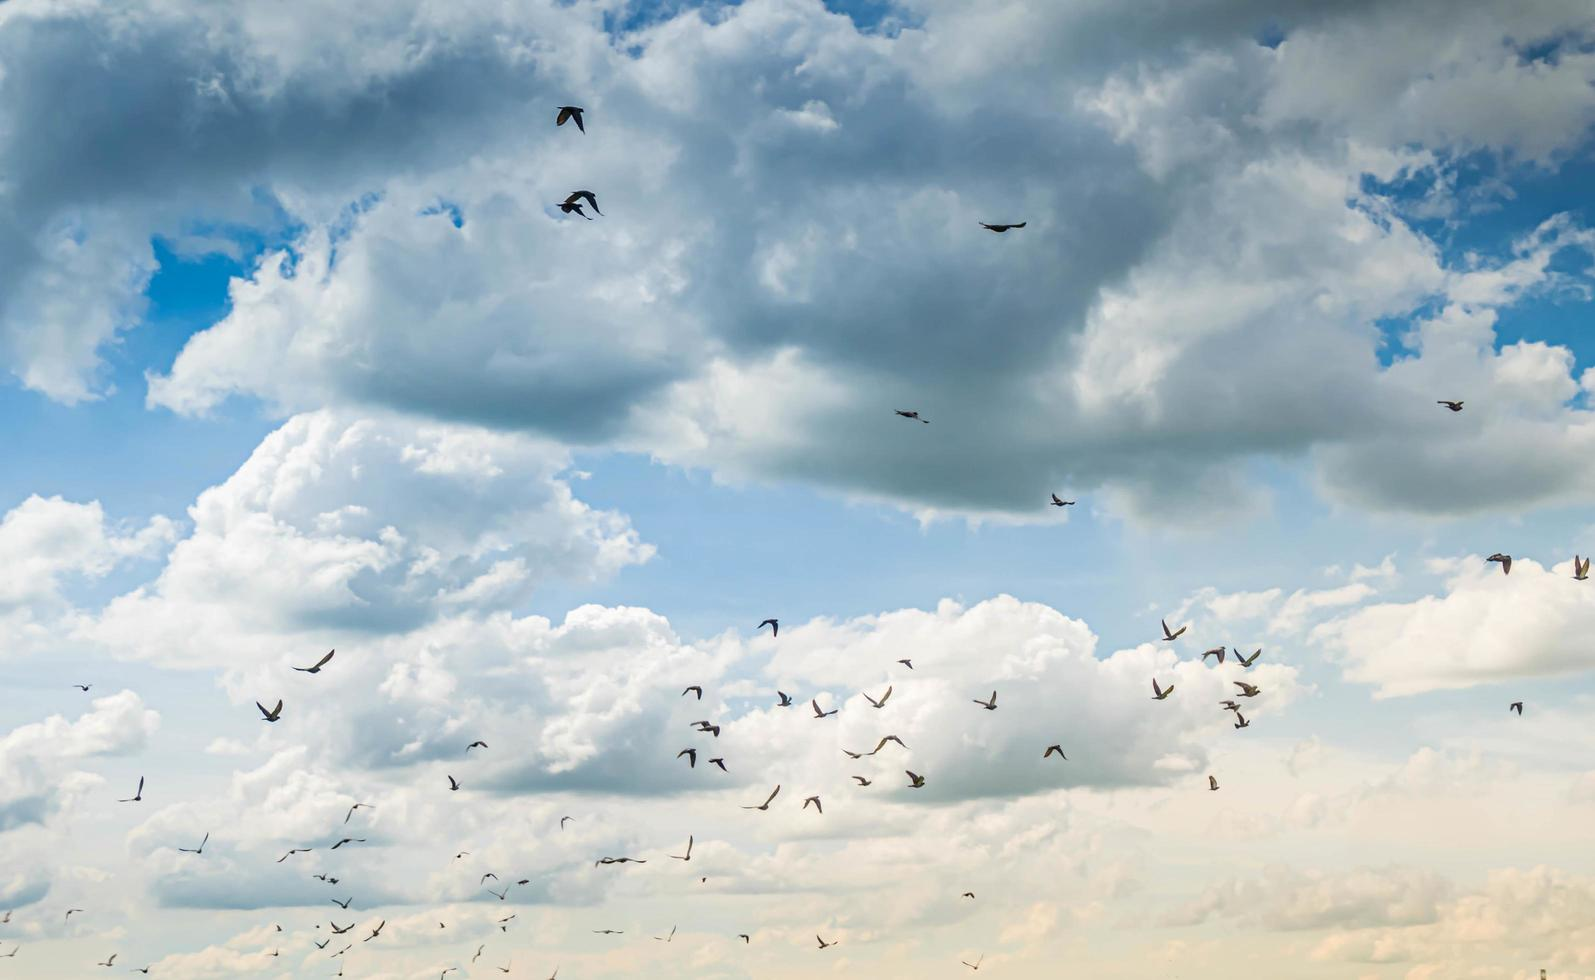 Sonnenuntergang Himmel bei Staub mit Vögeln foto